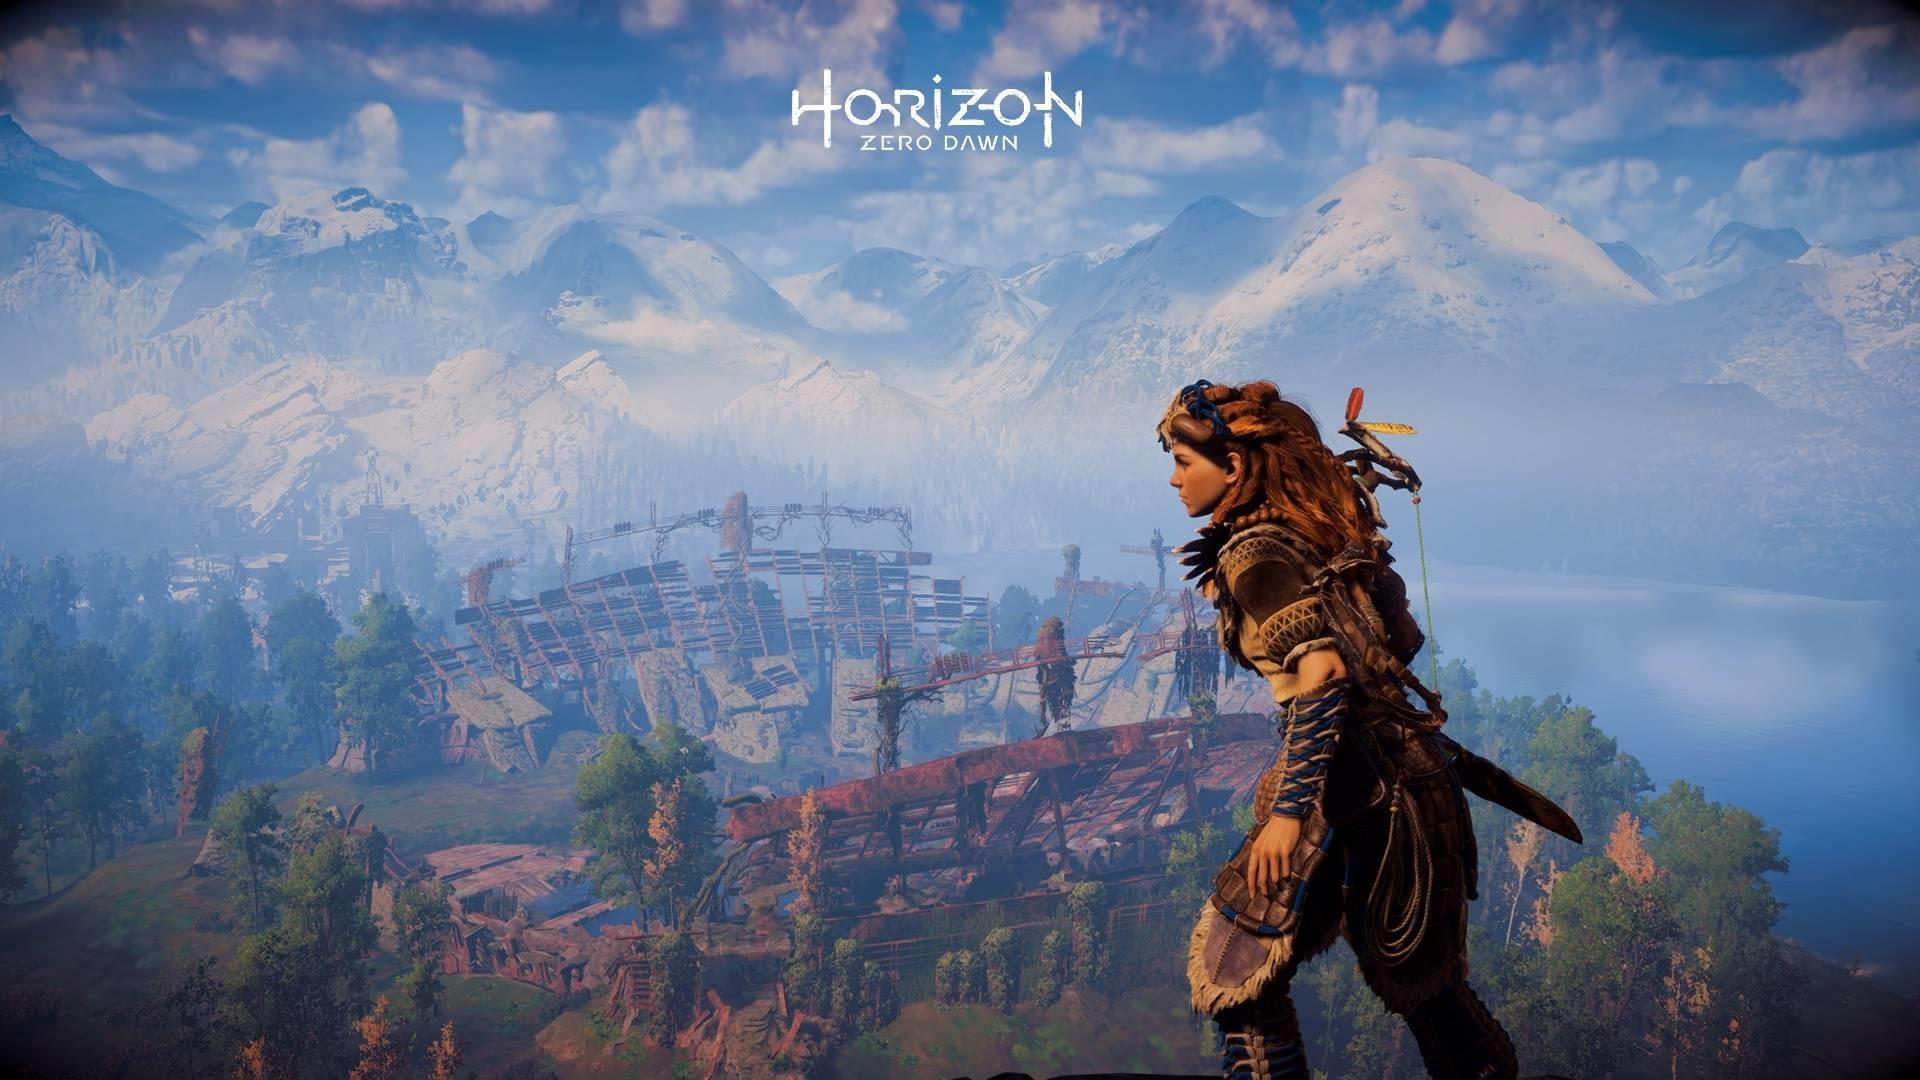 Horizon Zero Dawn Wallpapers 84 Images